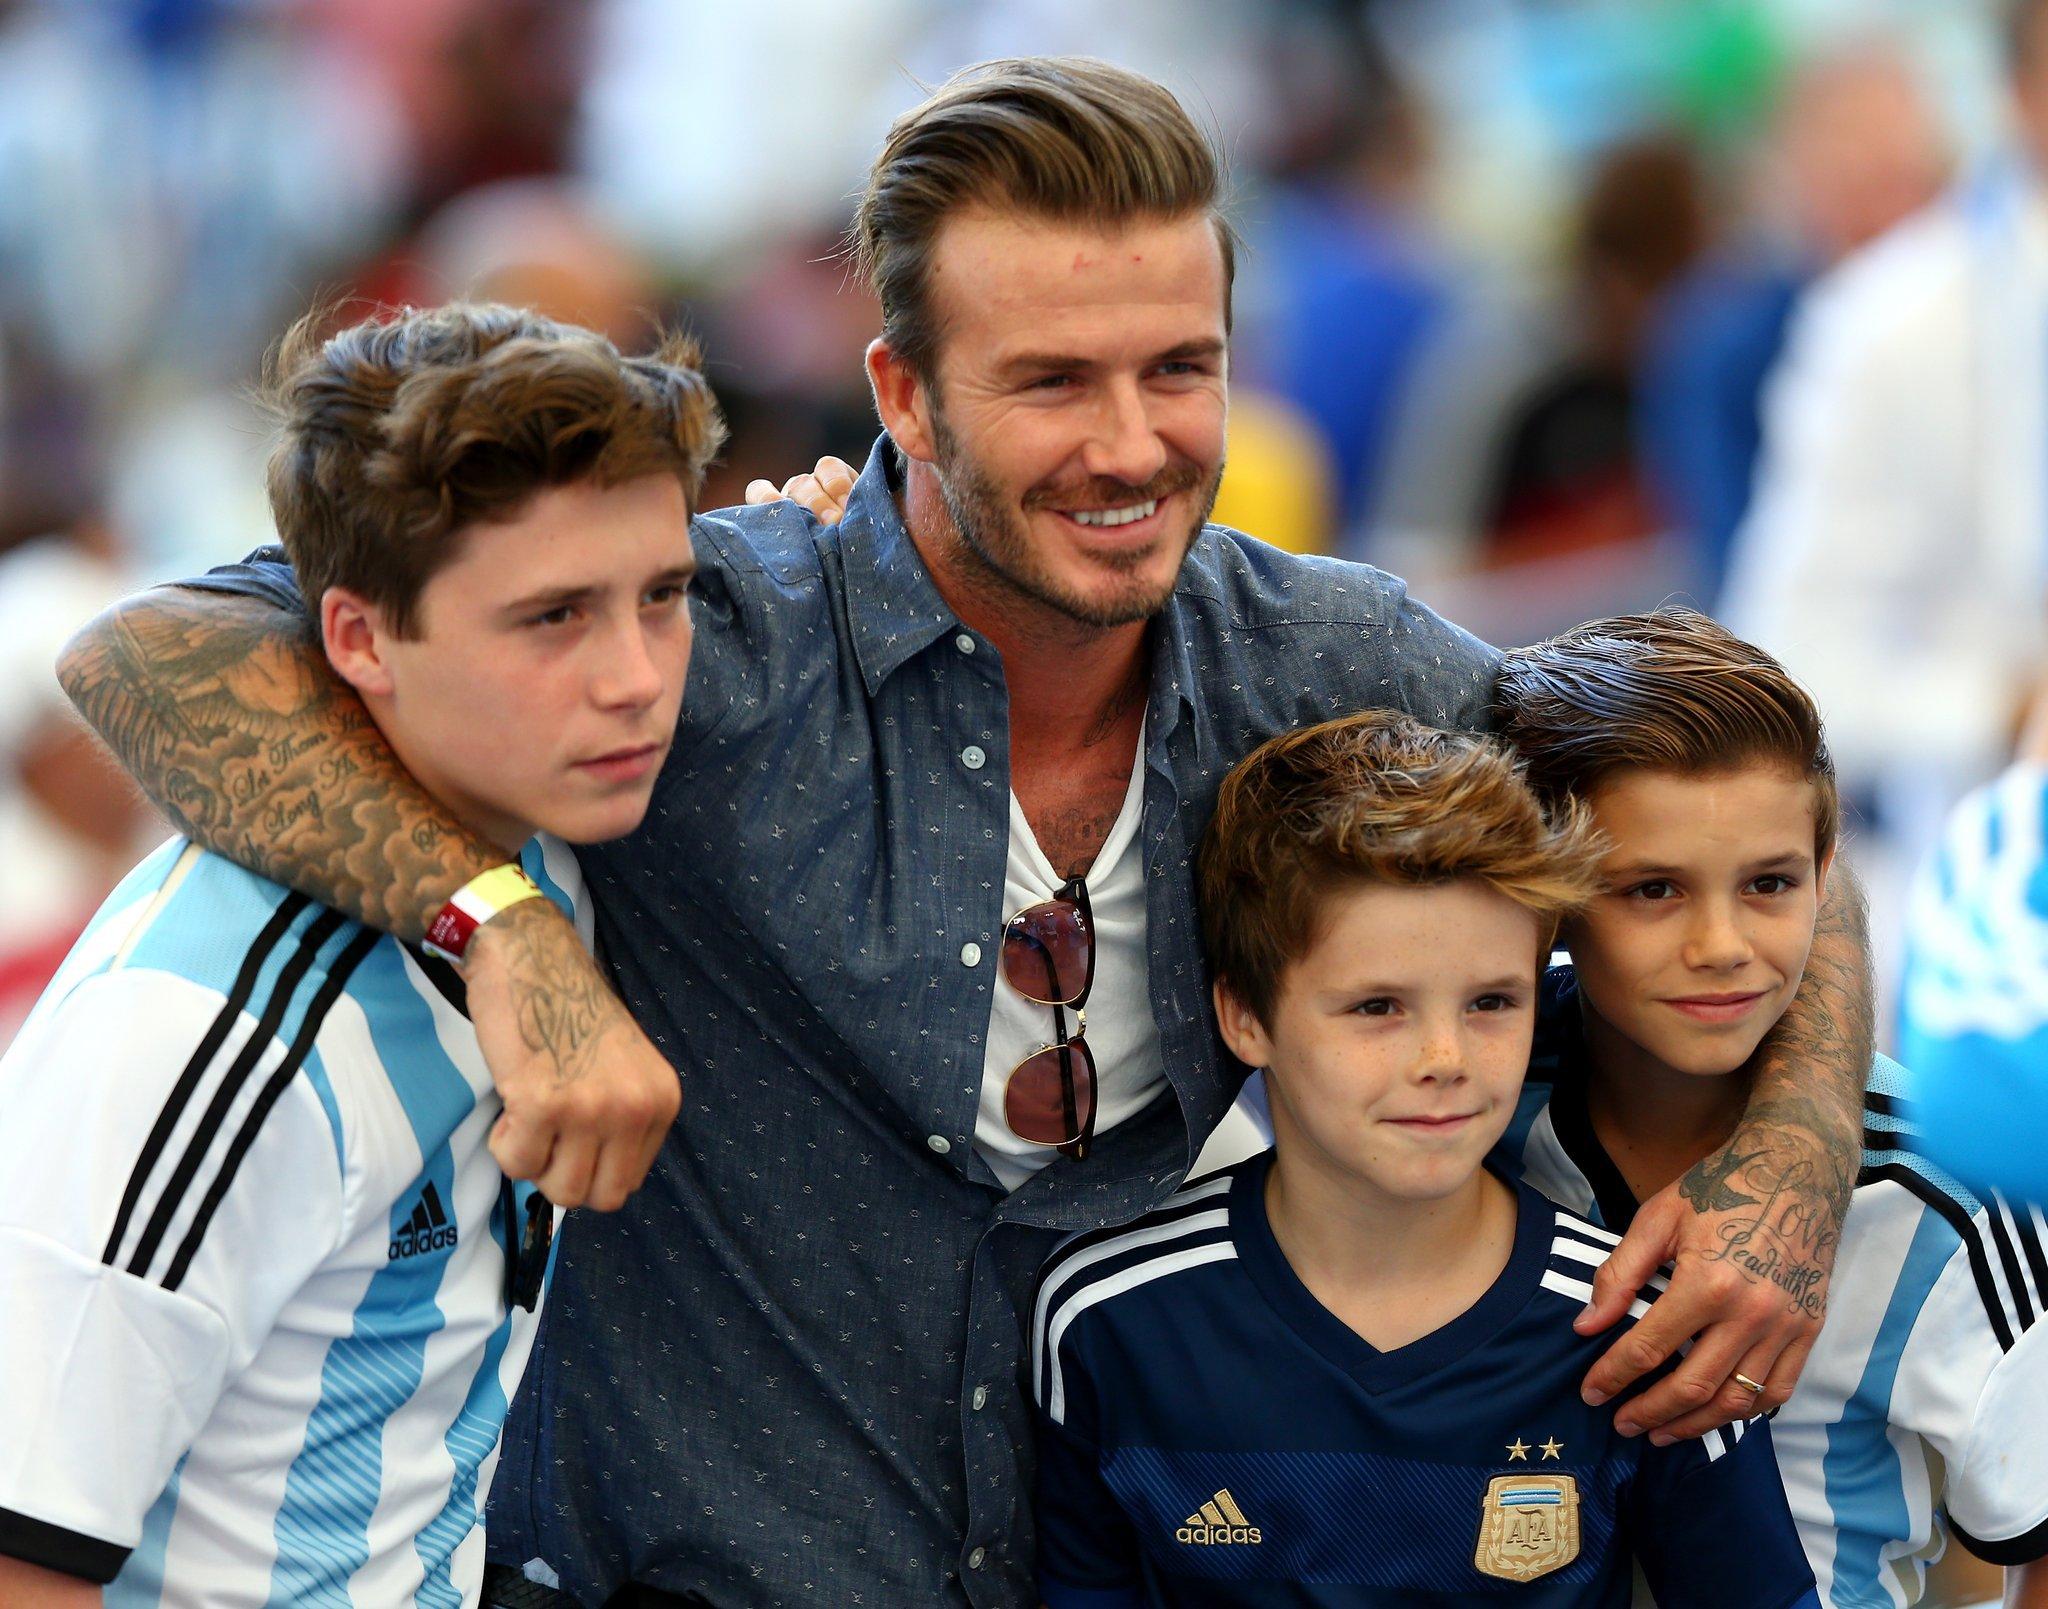 Romeo Beckham High Quality Wallpapers